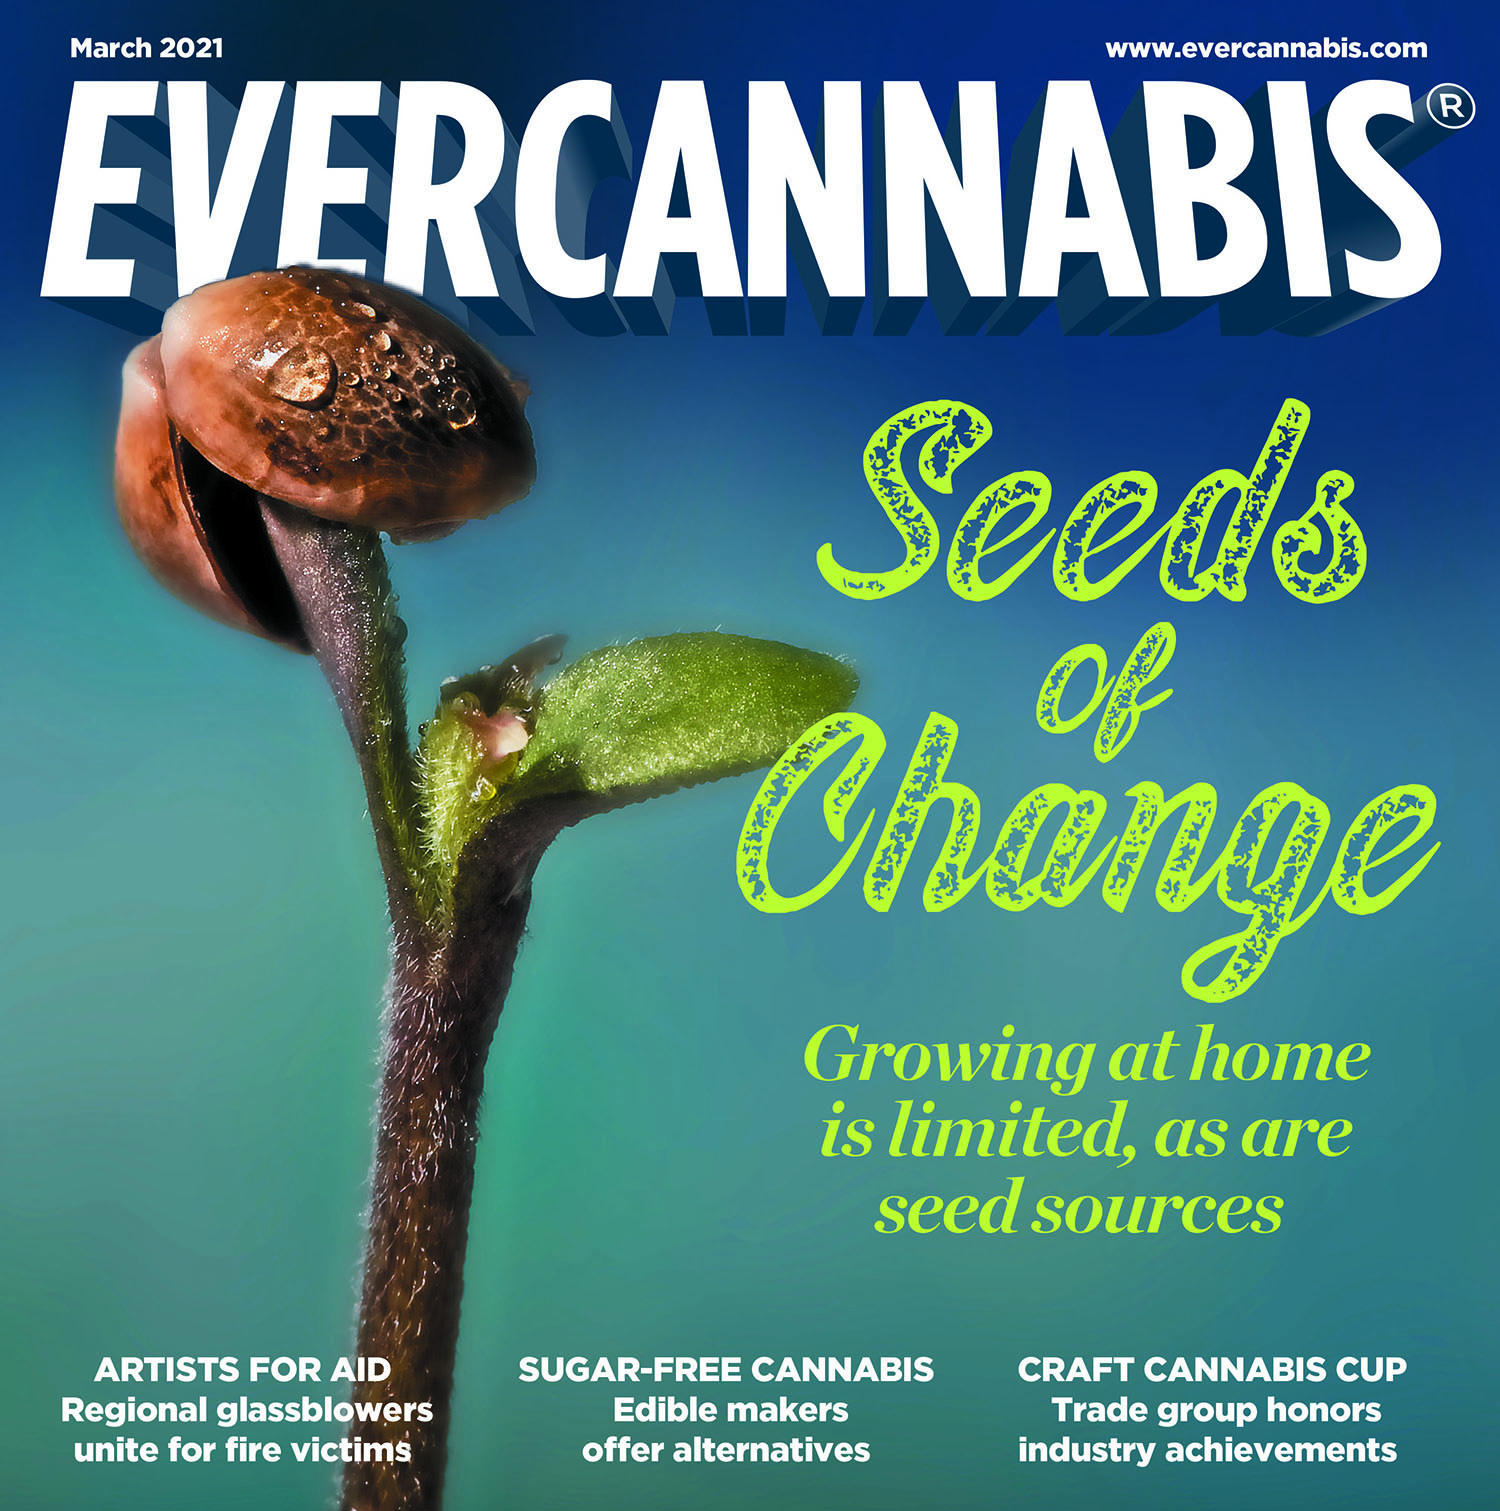 Evercannabis March 2021